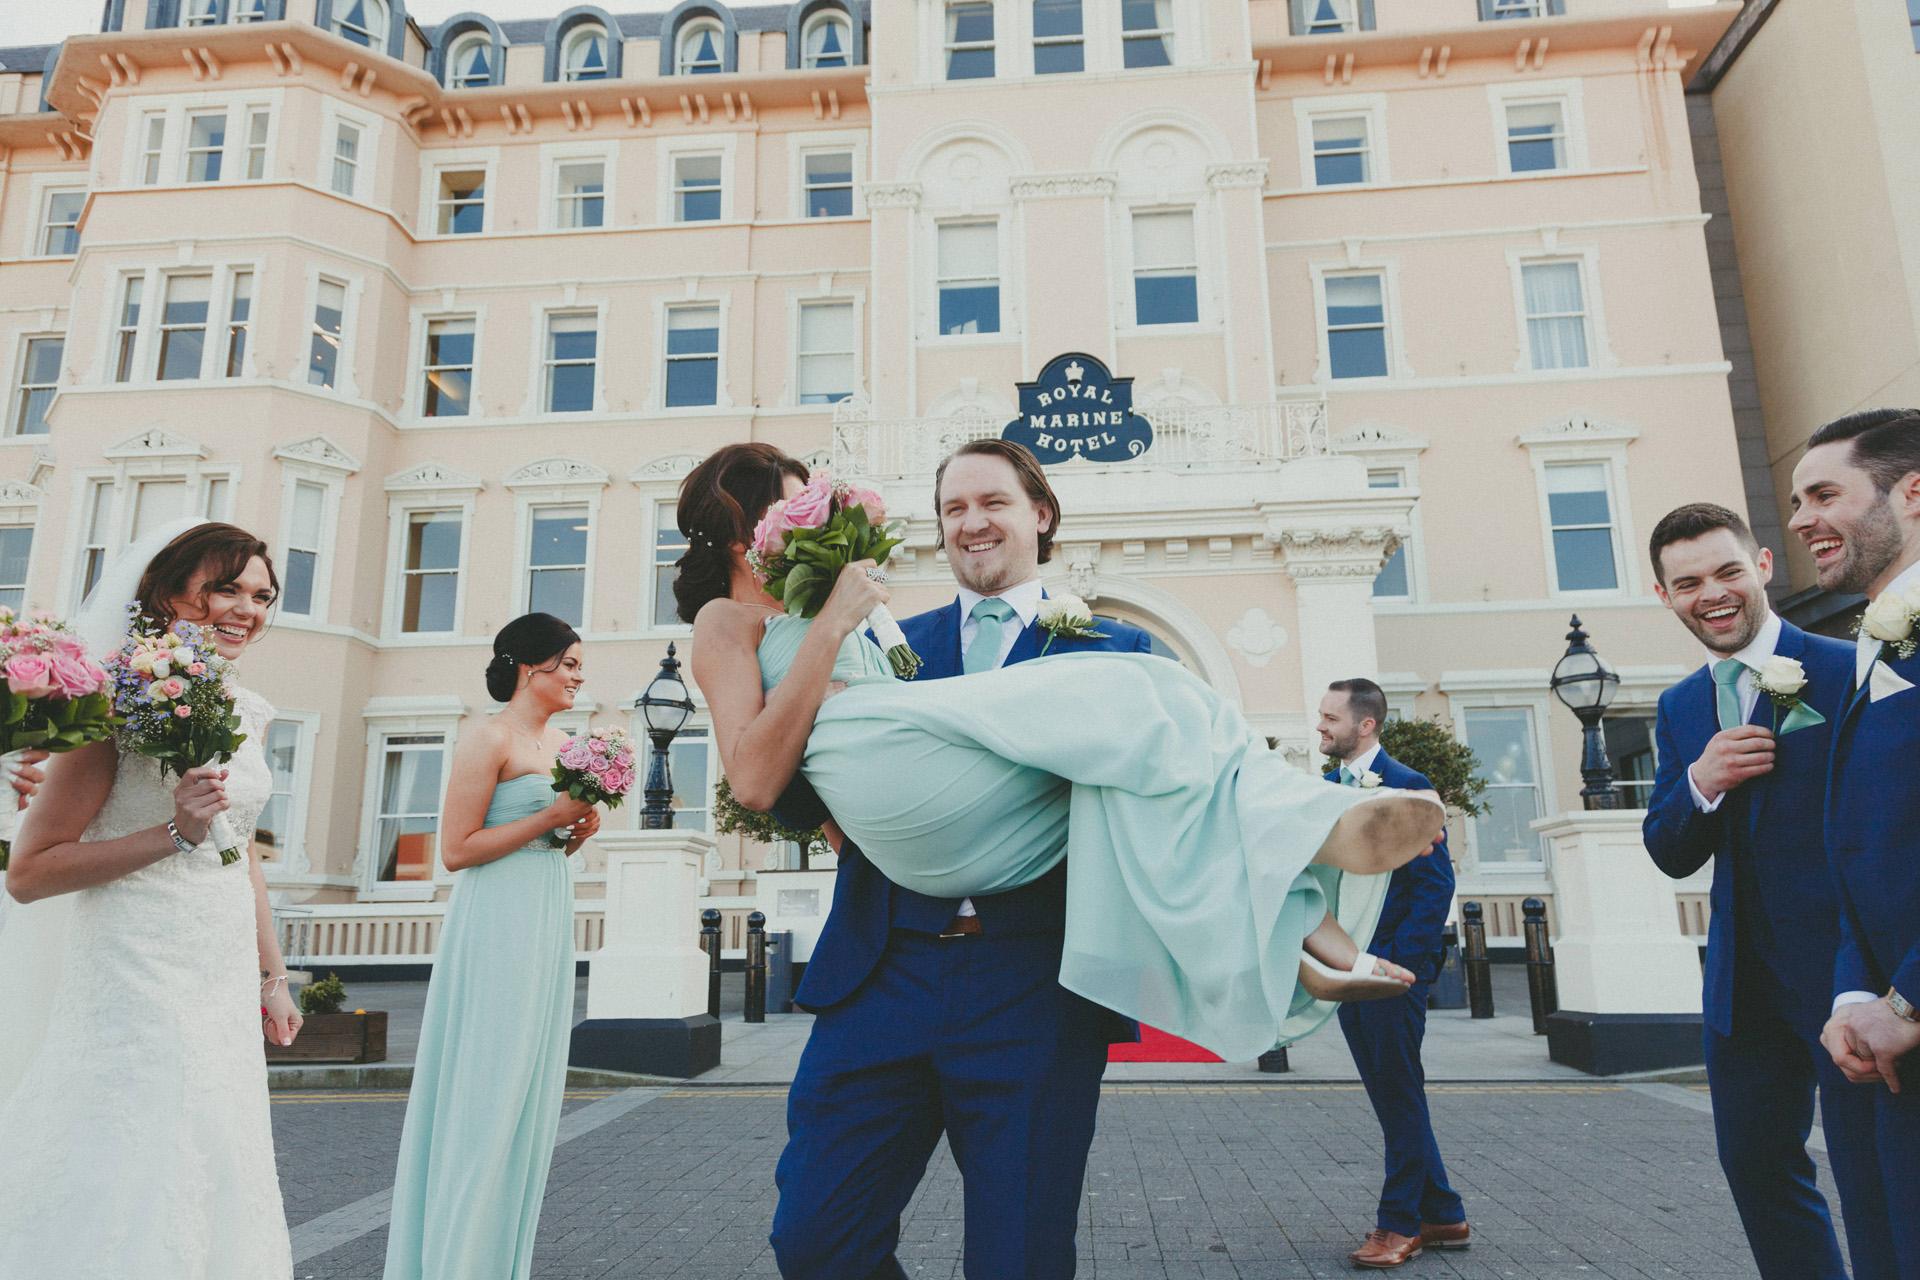 Royal-marine-hotel-wedding-photos10